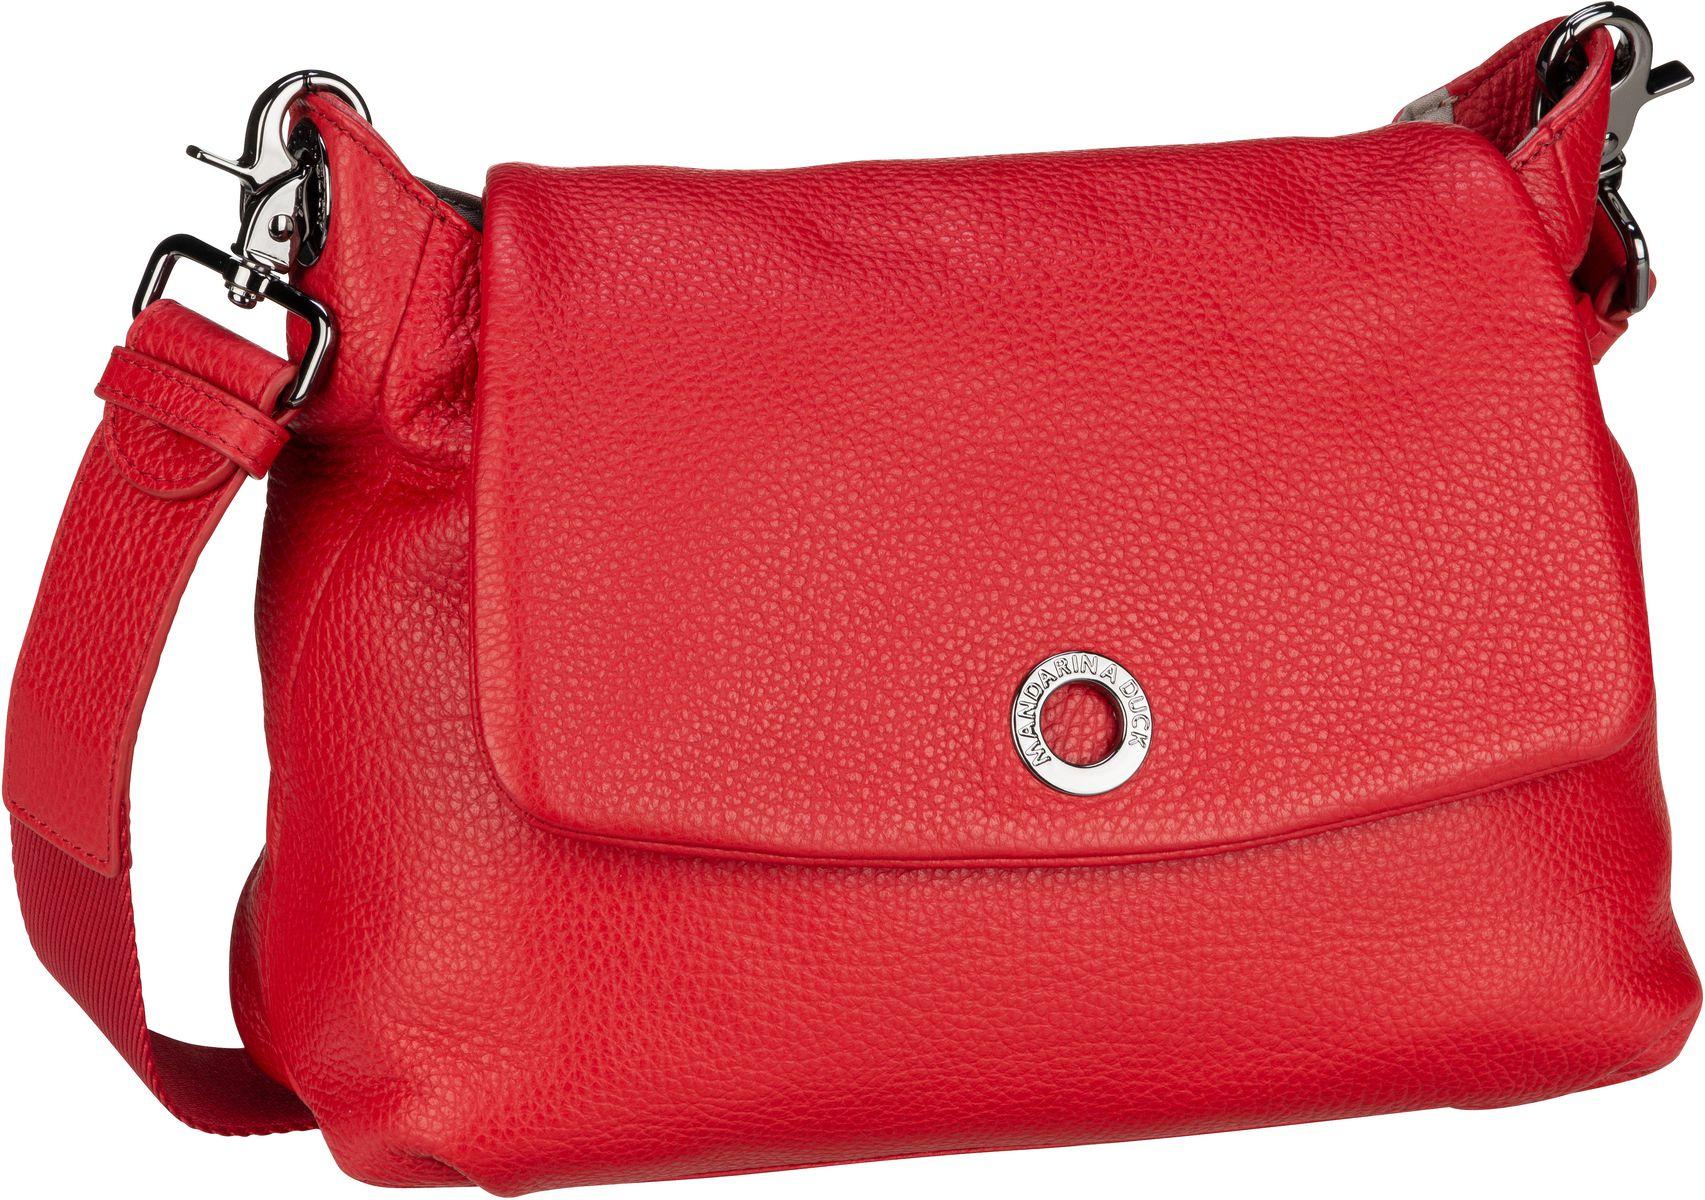 Umhängetasche Mellow Leather Small Shoulder Bag FZT31 Flame Scarlet